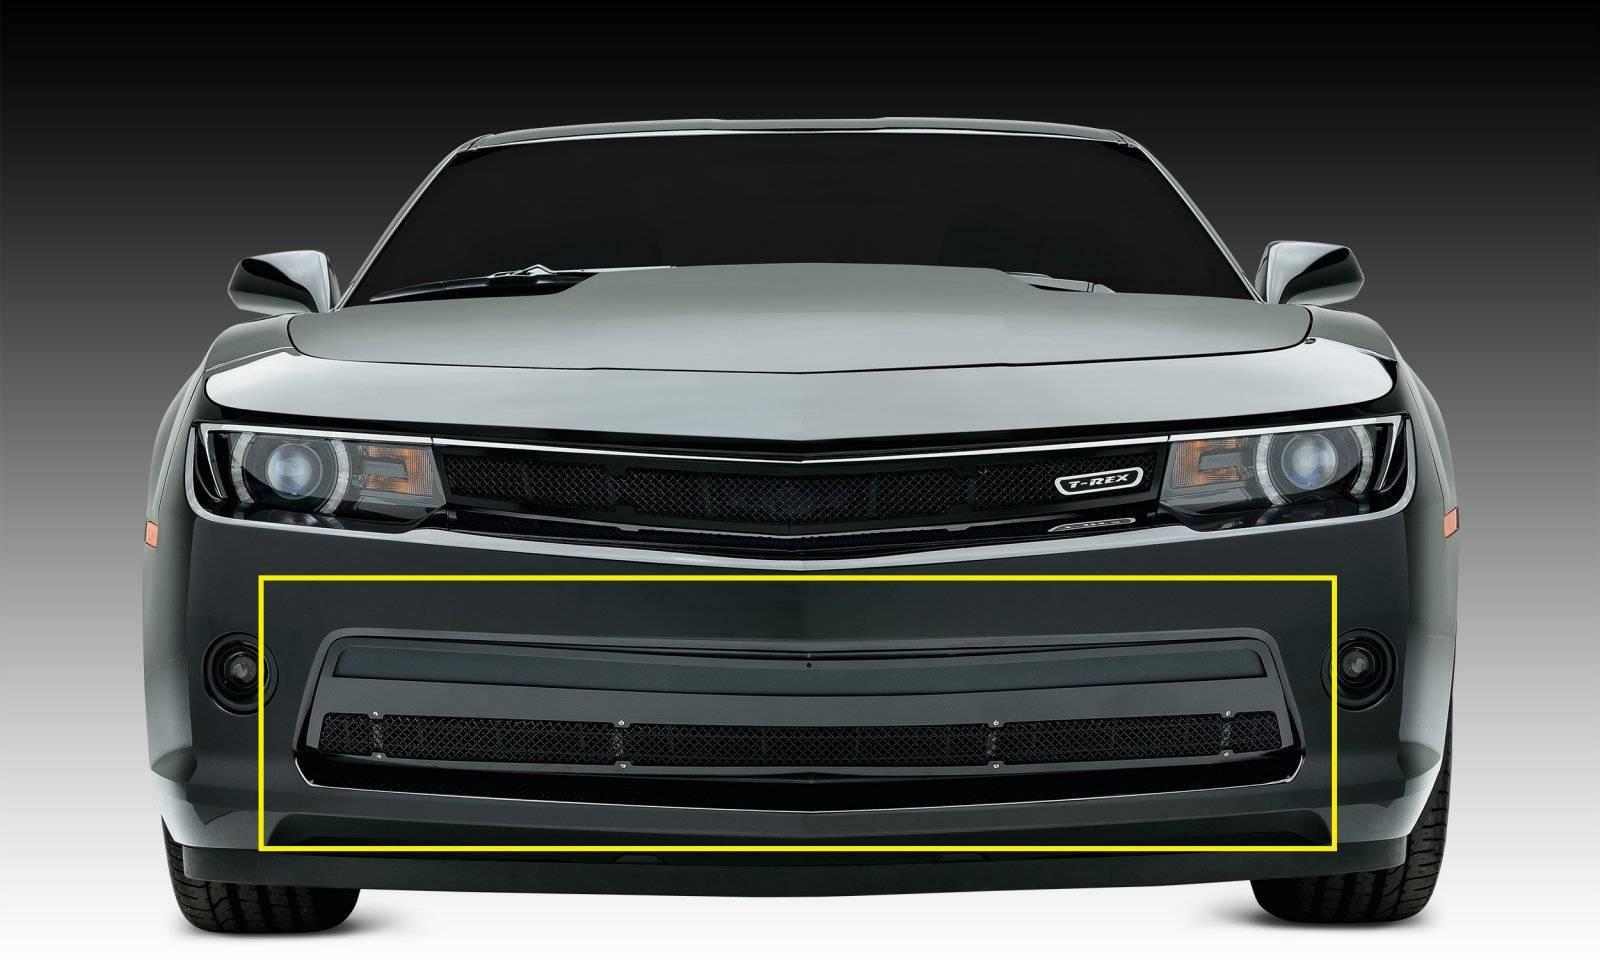 T-REX Grilles - 2014-2015 Camaro Upper Class Series Bumper Grille, Black, 1 Pc, Overlay, V6 - PN #52031